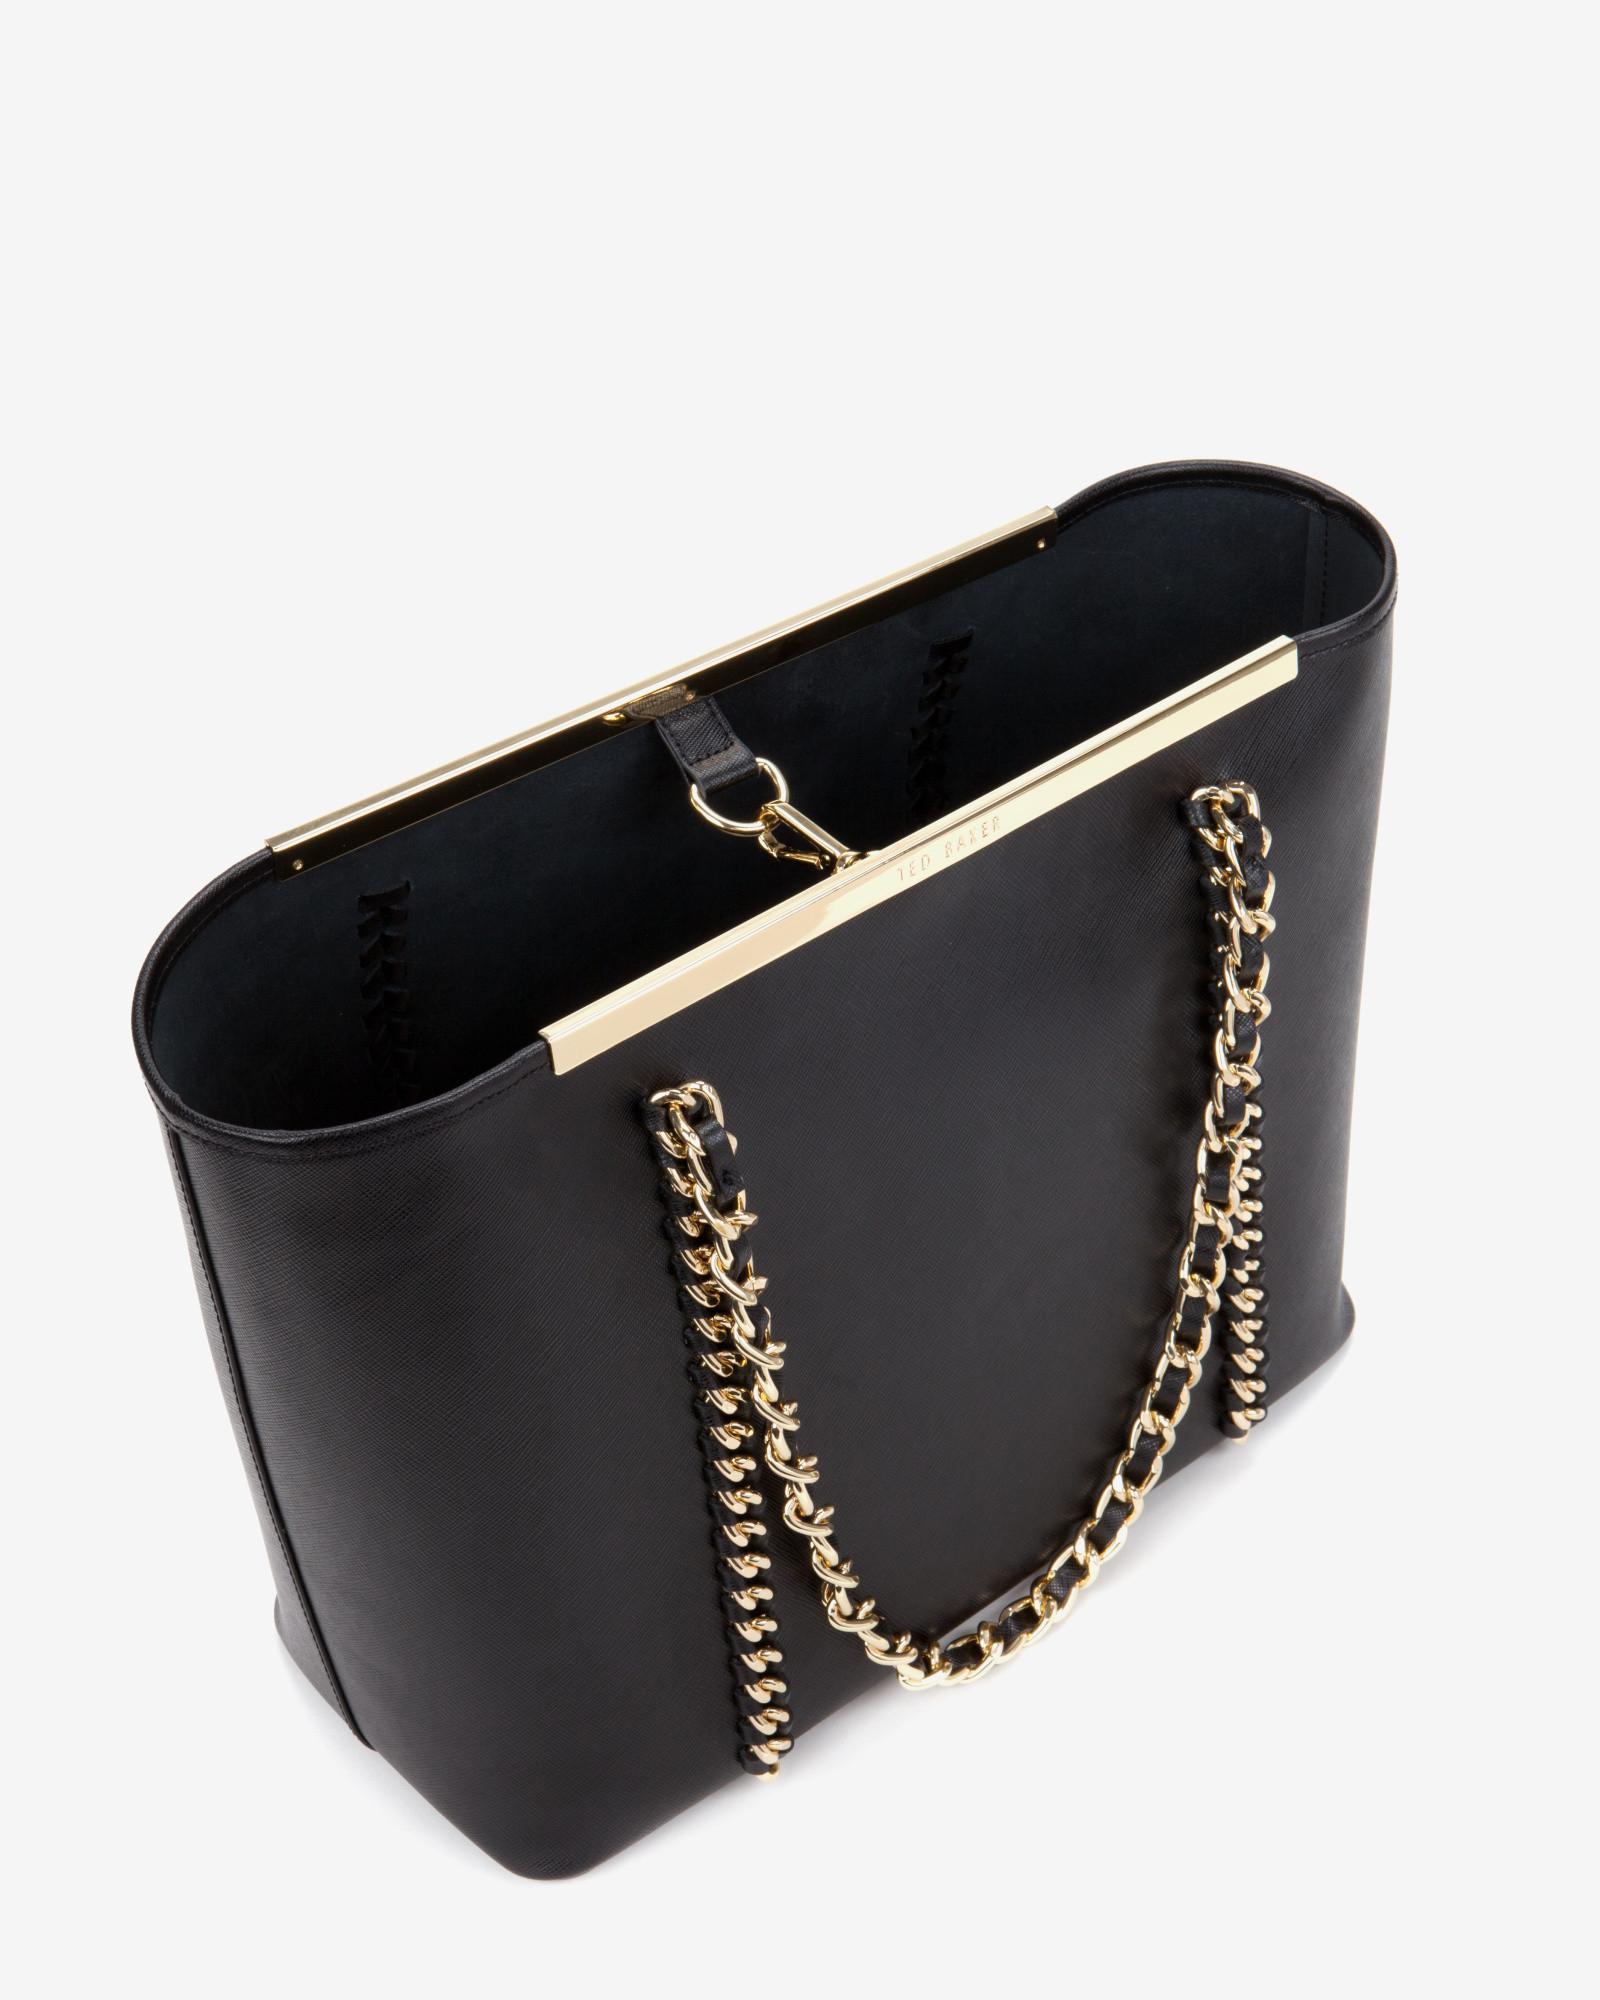 60314544023f4e Ted Baker Metal Chain Shopper Bag in Black - Lyst